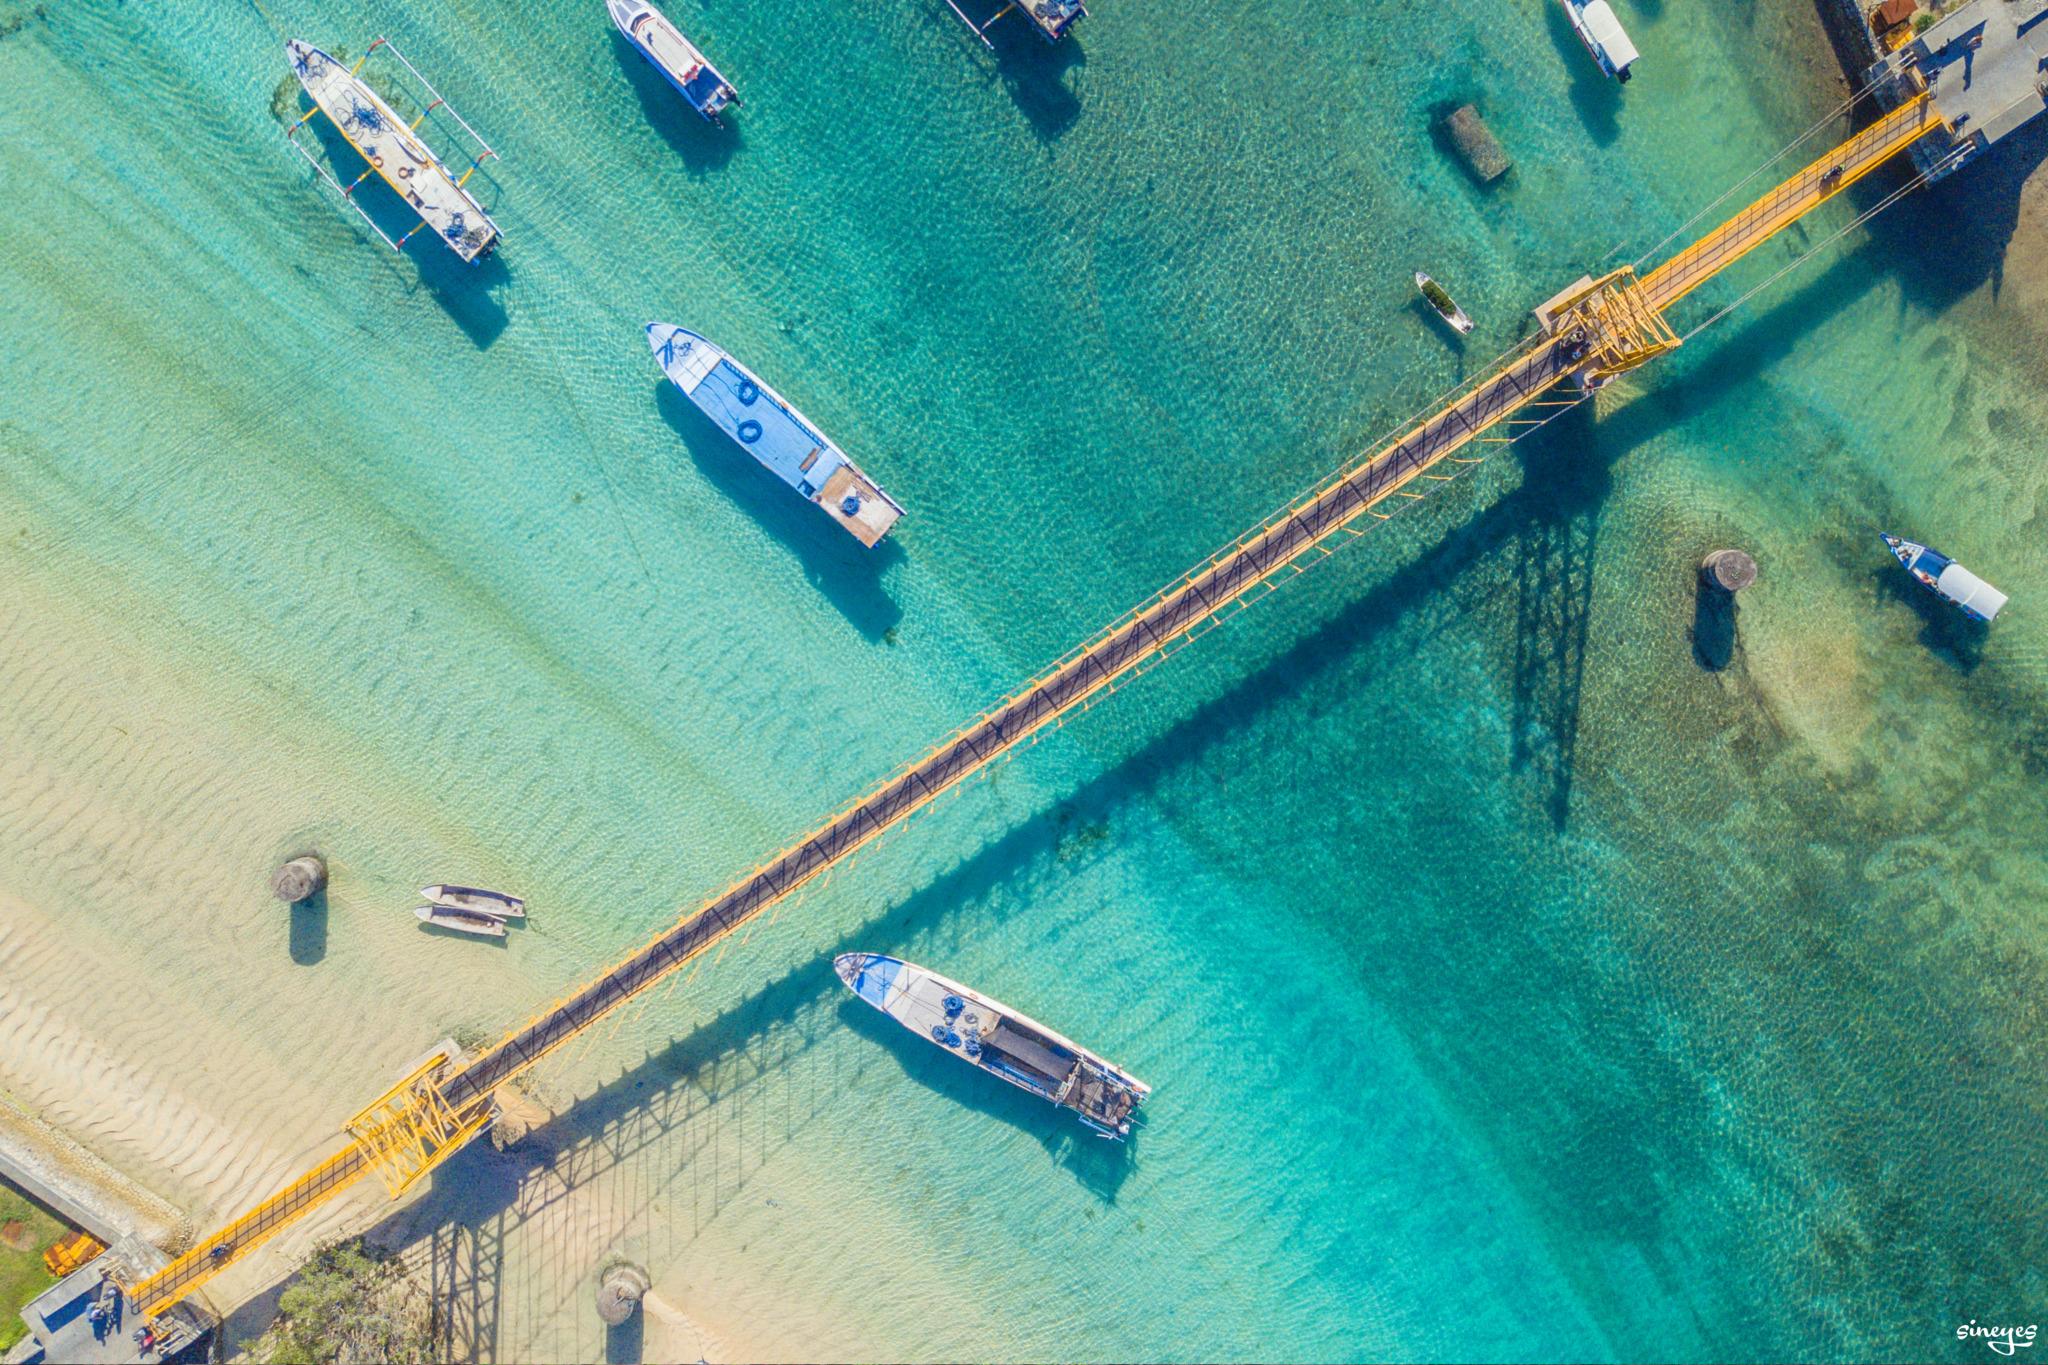 Ceningan bridge by sineyes